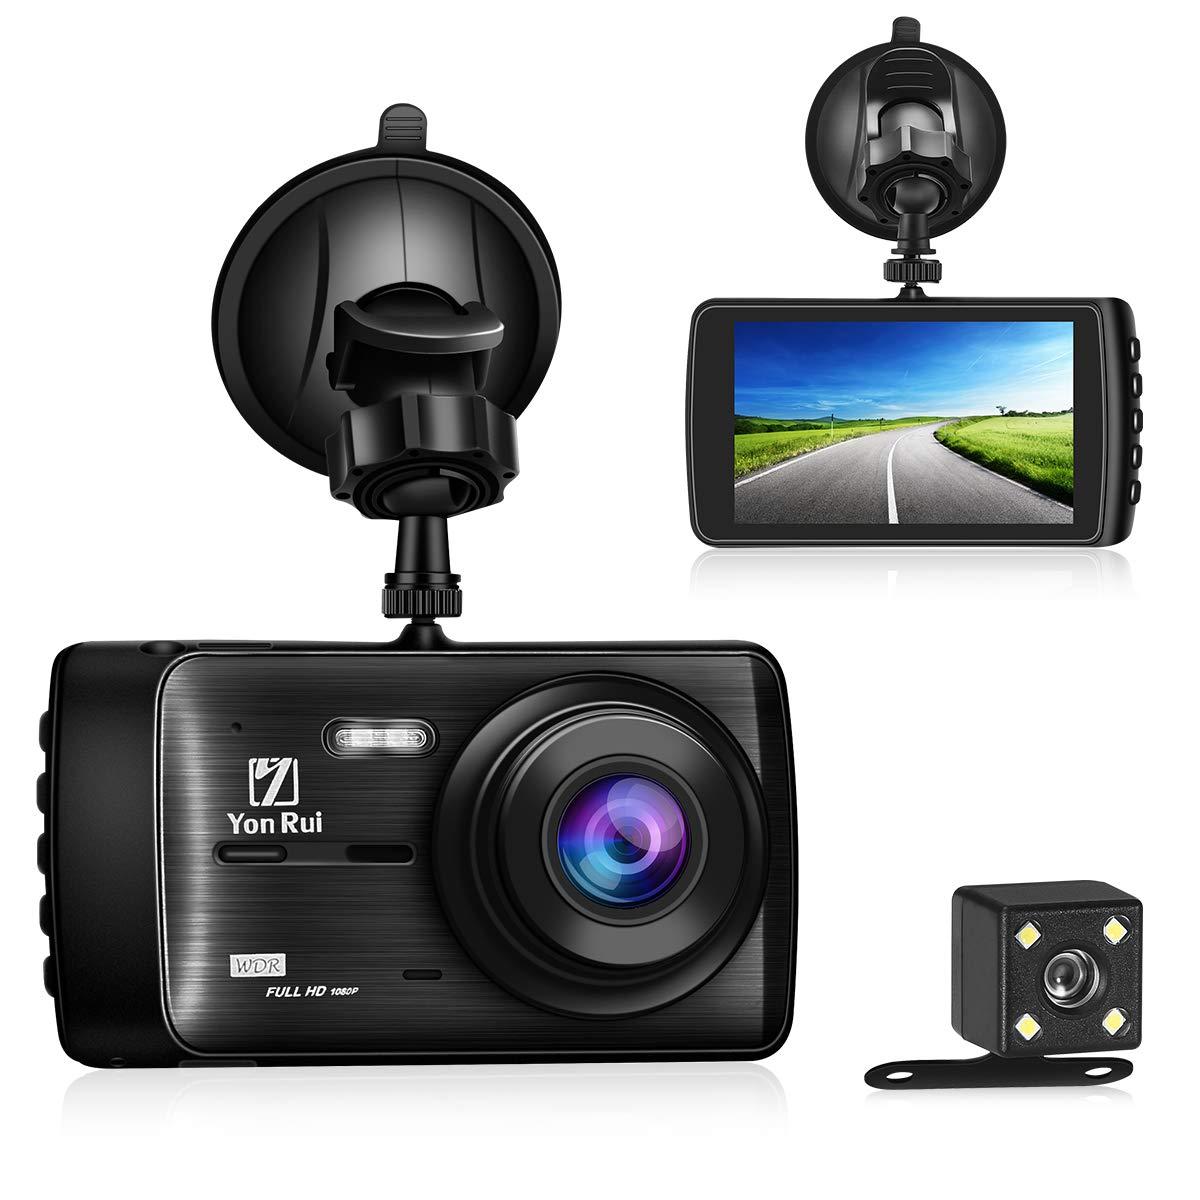 Dash Cam YonRui 1080P Full HD 4.0'' Car Dashboard Camera Recorder Car DVR 1080P HD Night Vision Wide-Angle Car Video Recorder with G-Sensor Loop Recording YonRui Dash Cam